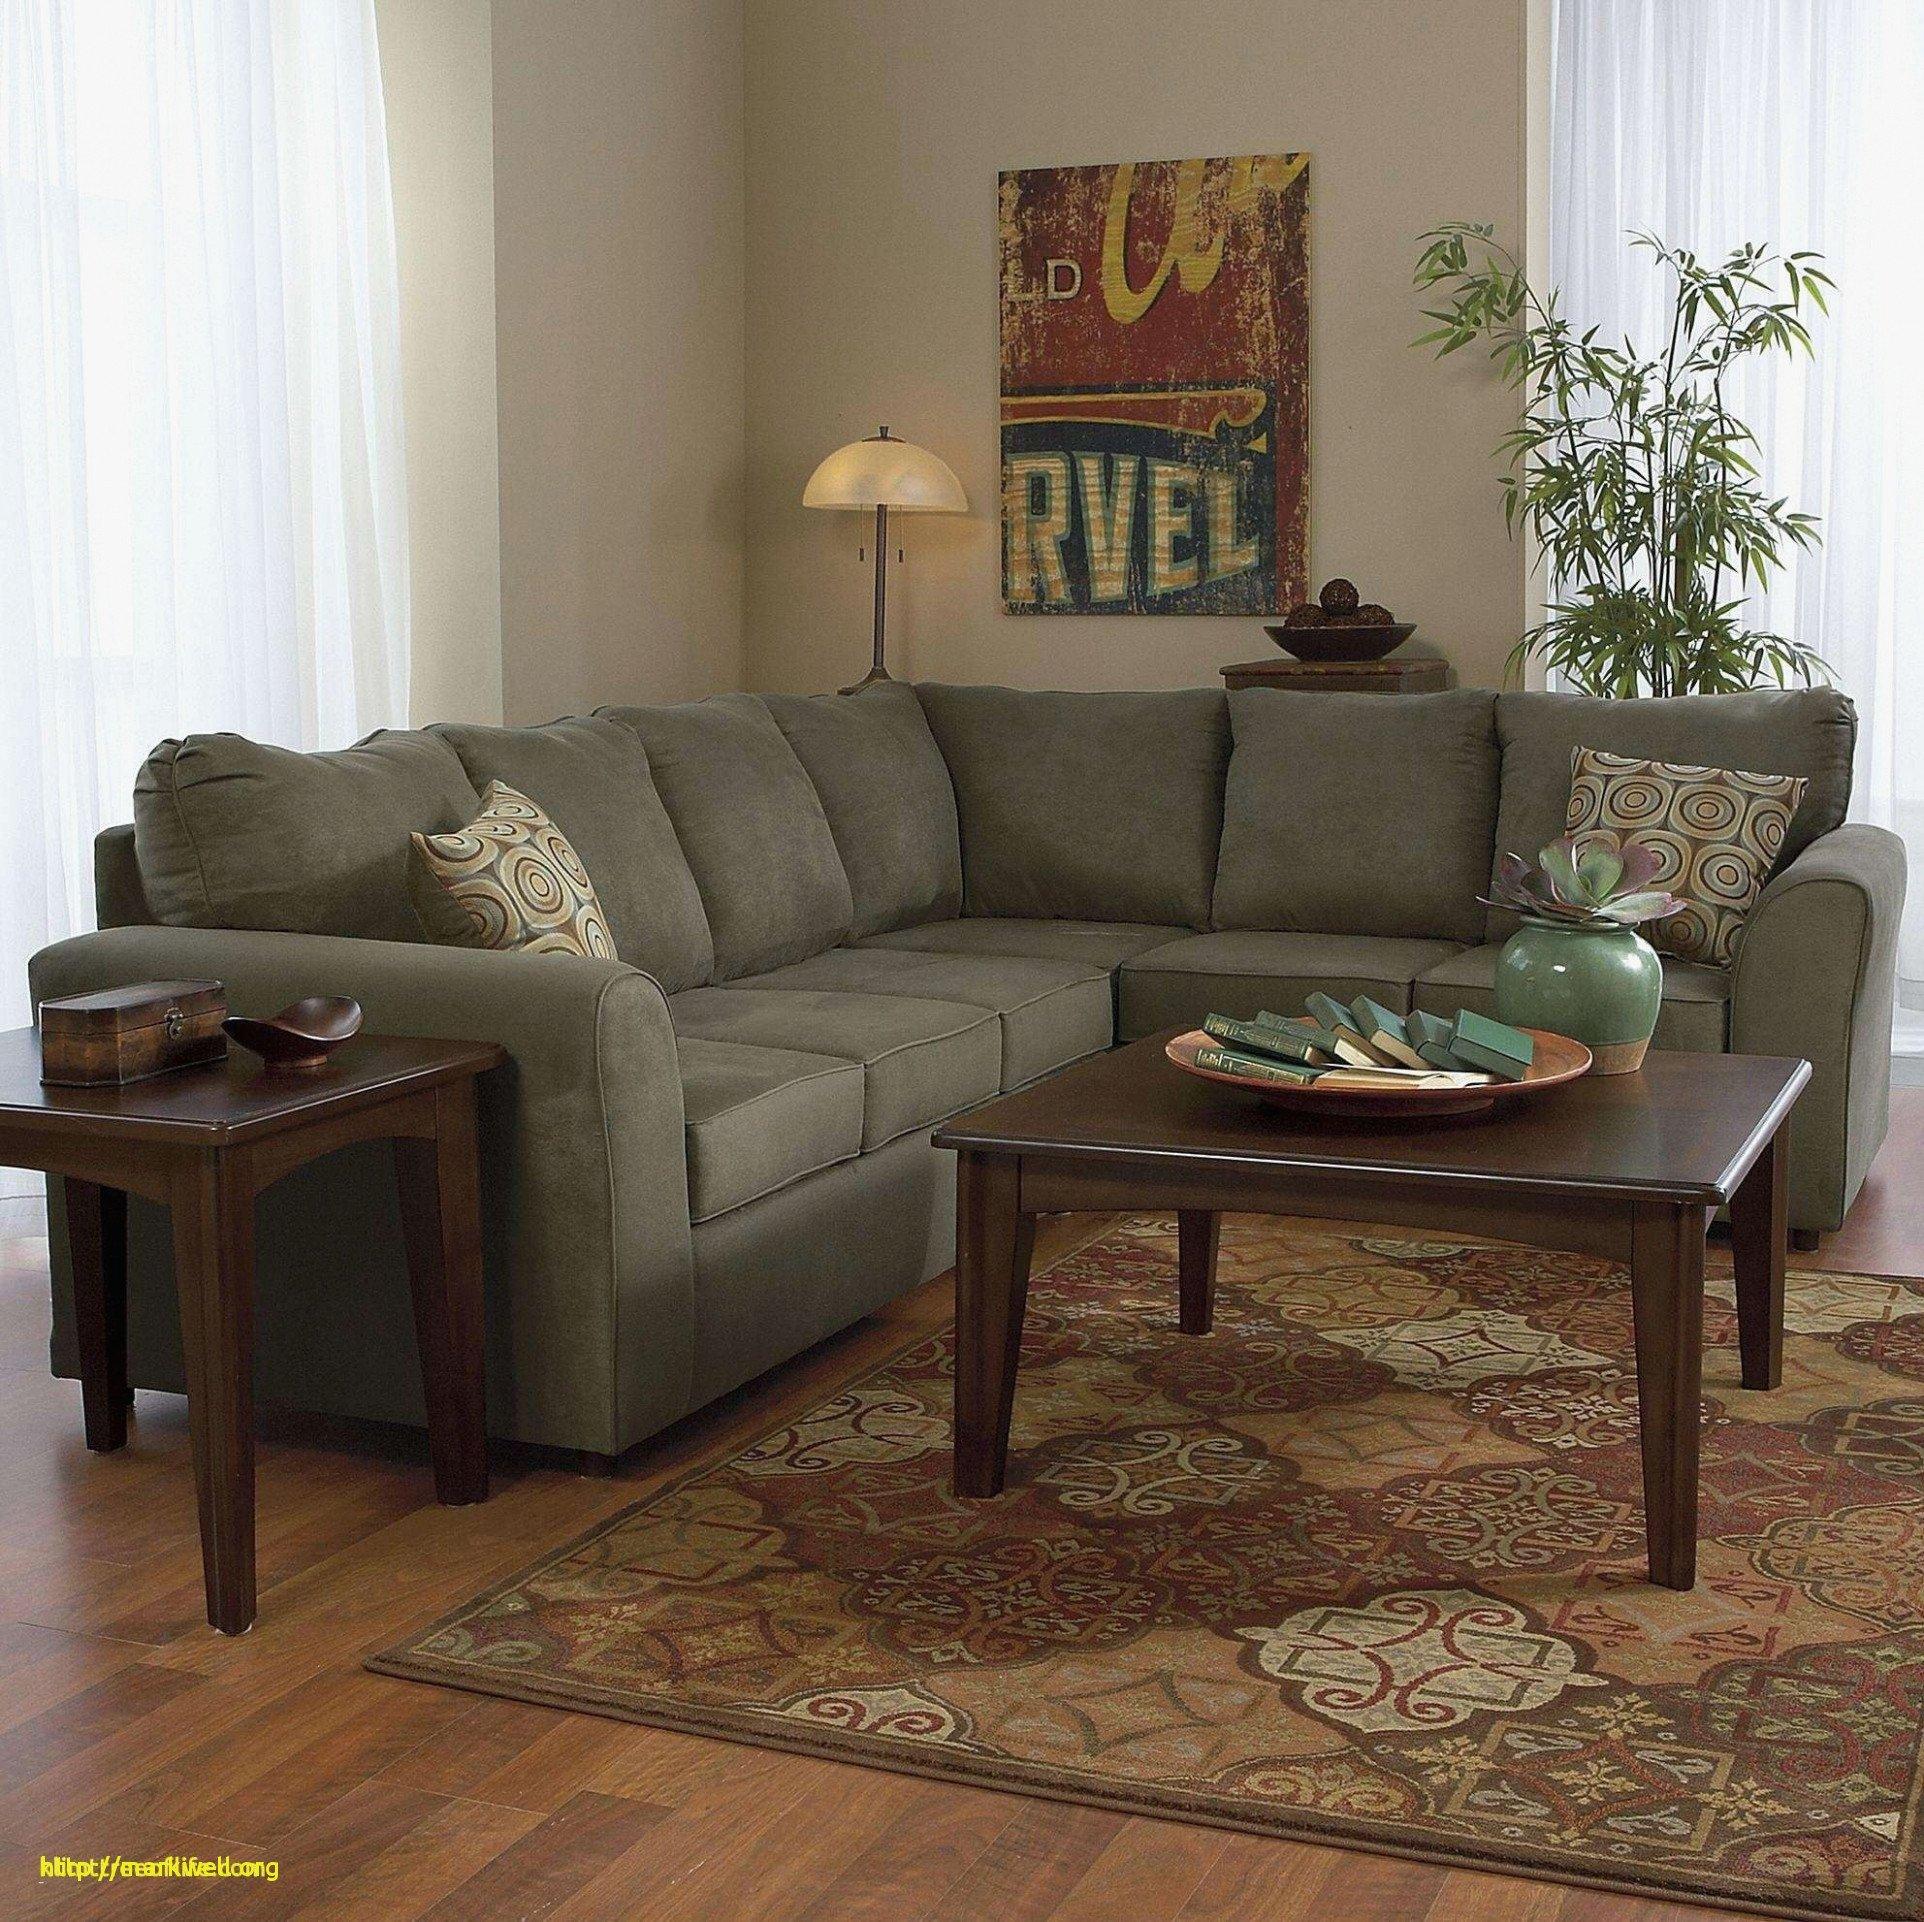 Sofa Bed for Bedroom Unique Unique Living Room Accent Furniture